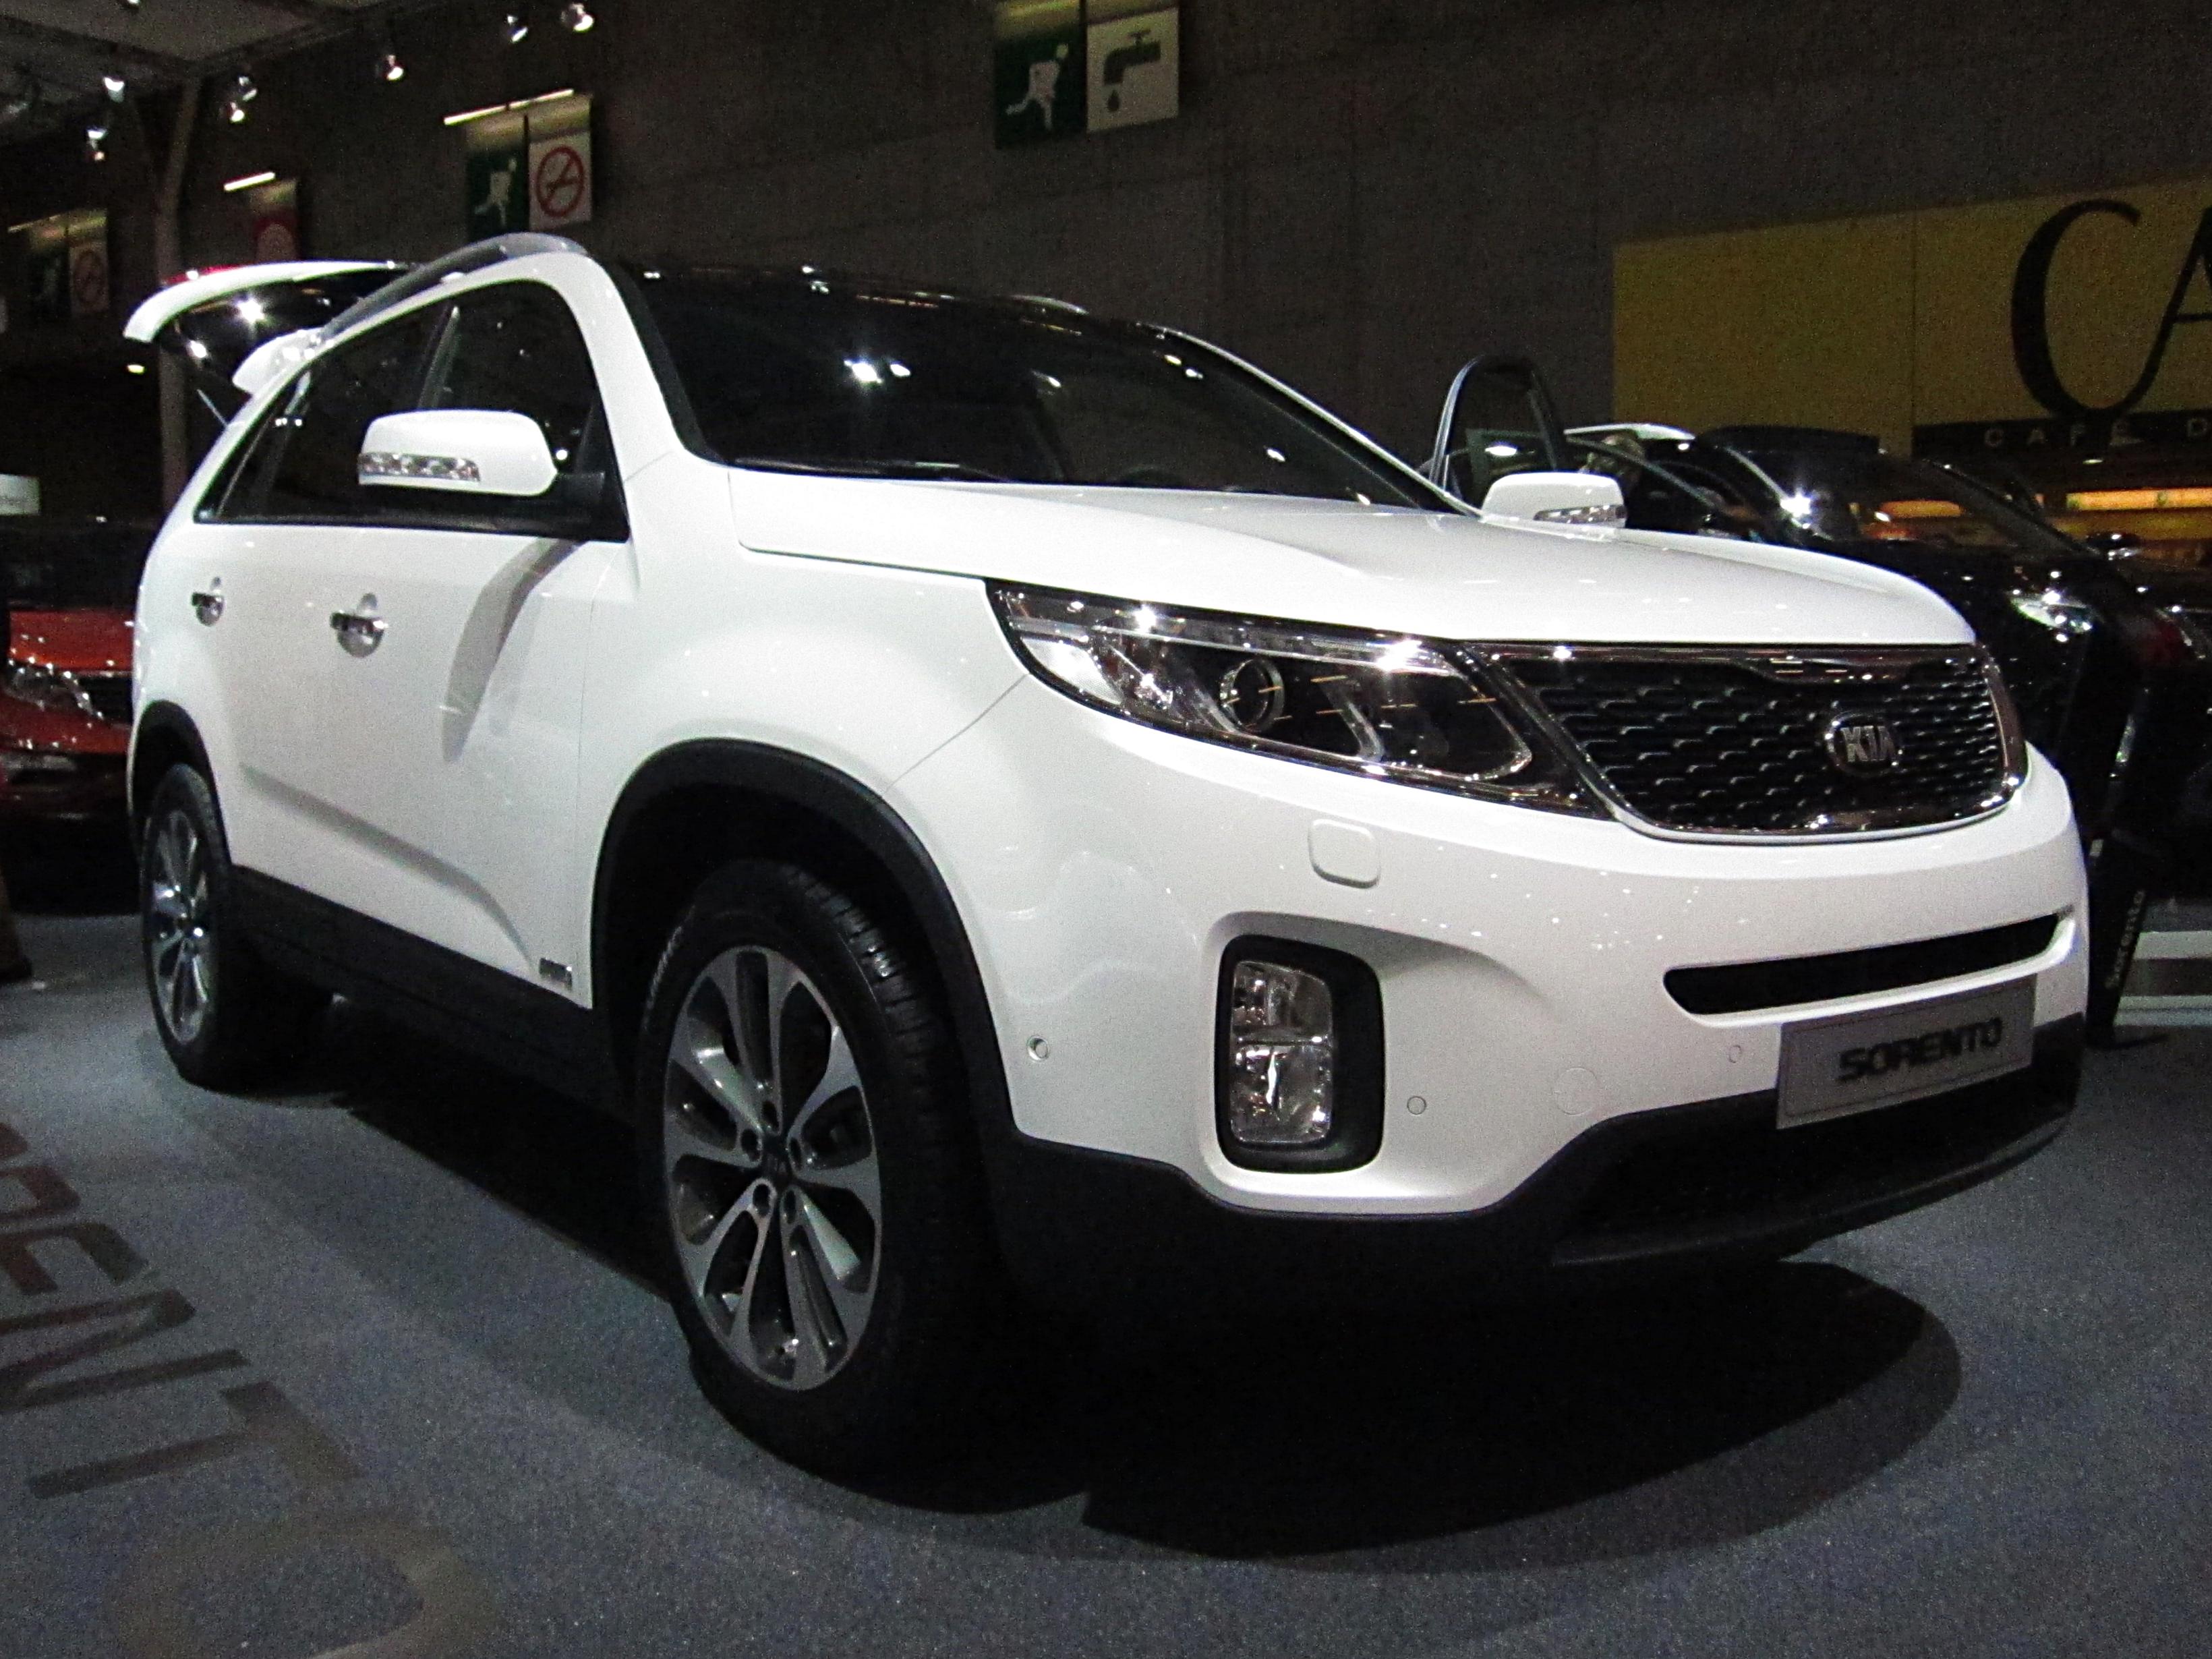 File:Kia Sorento facelift (front quarter).JPG - Wikimedia ...